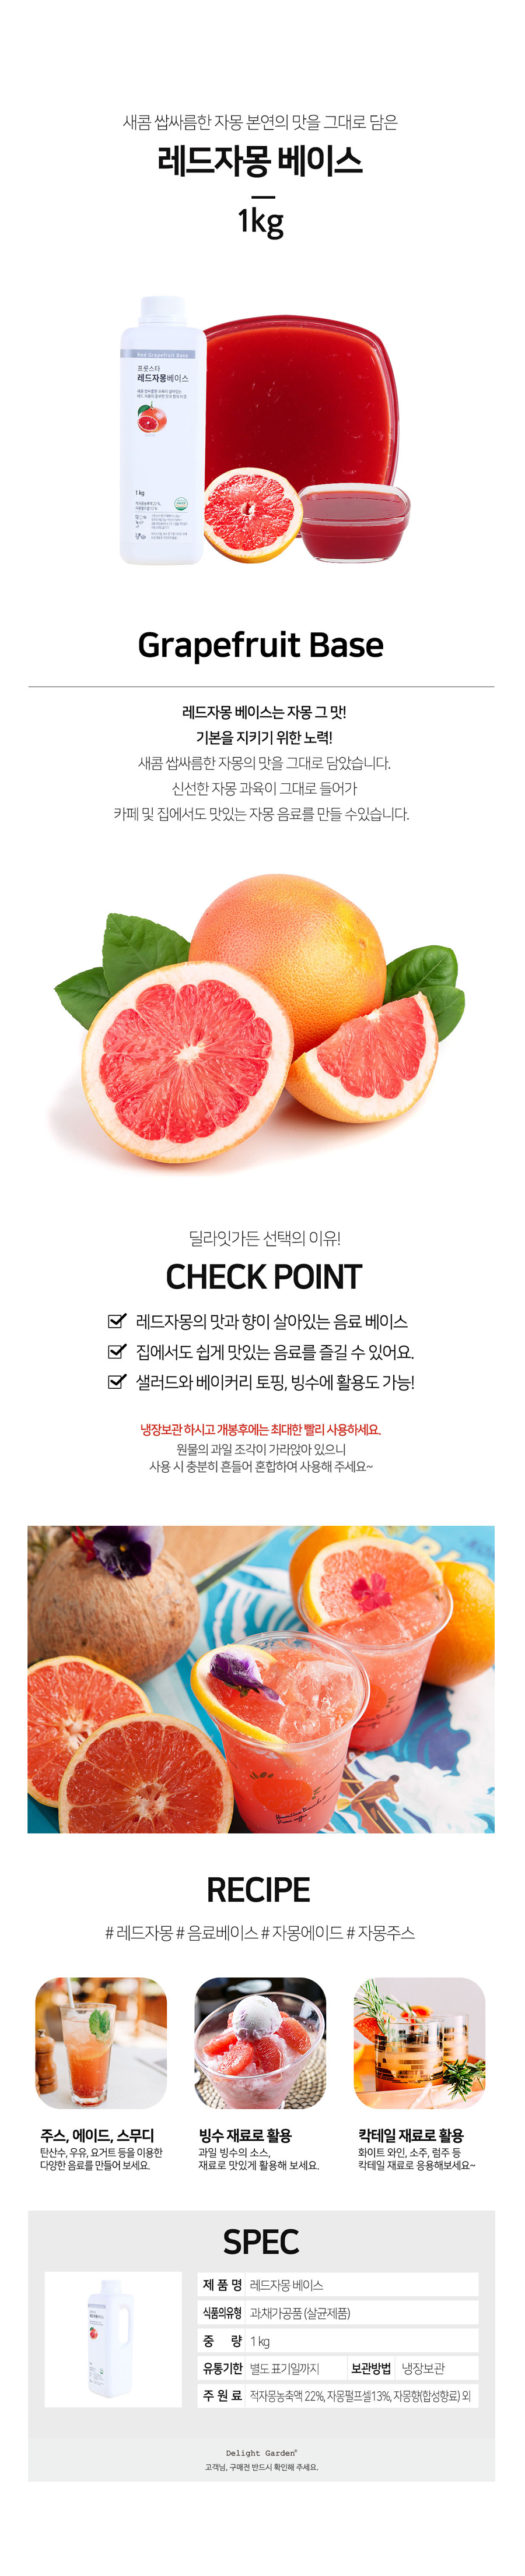 Red_Grapefruit_Base